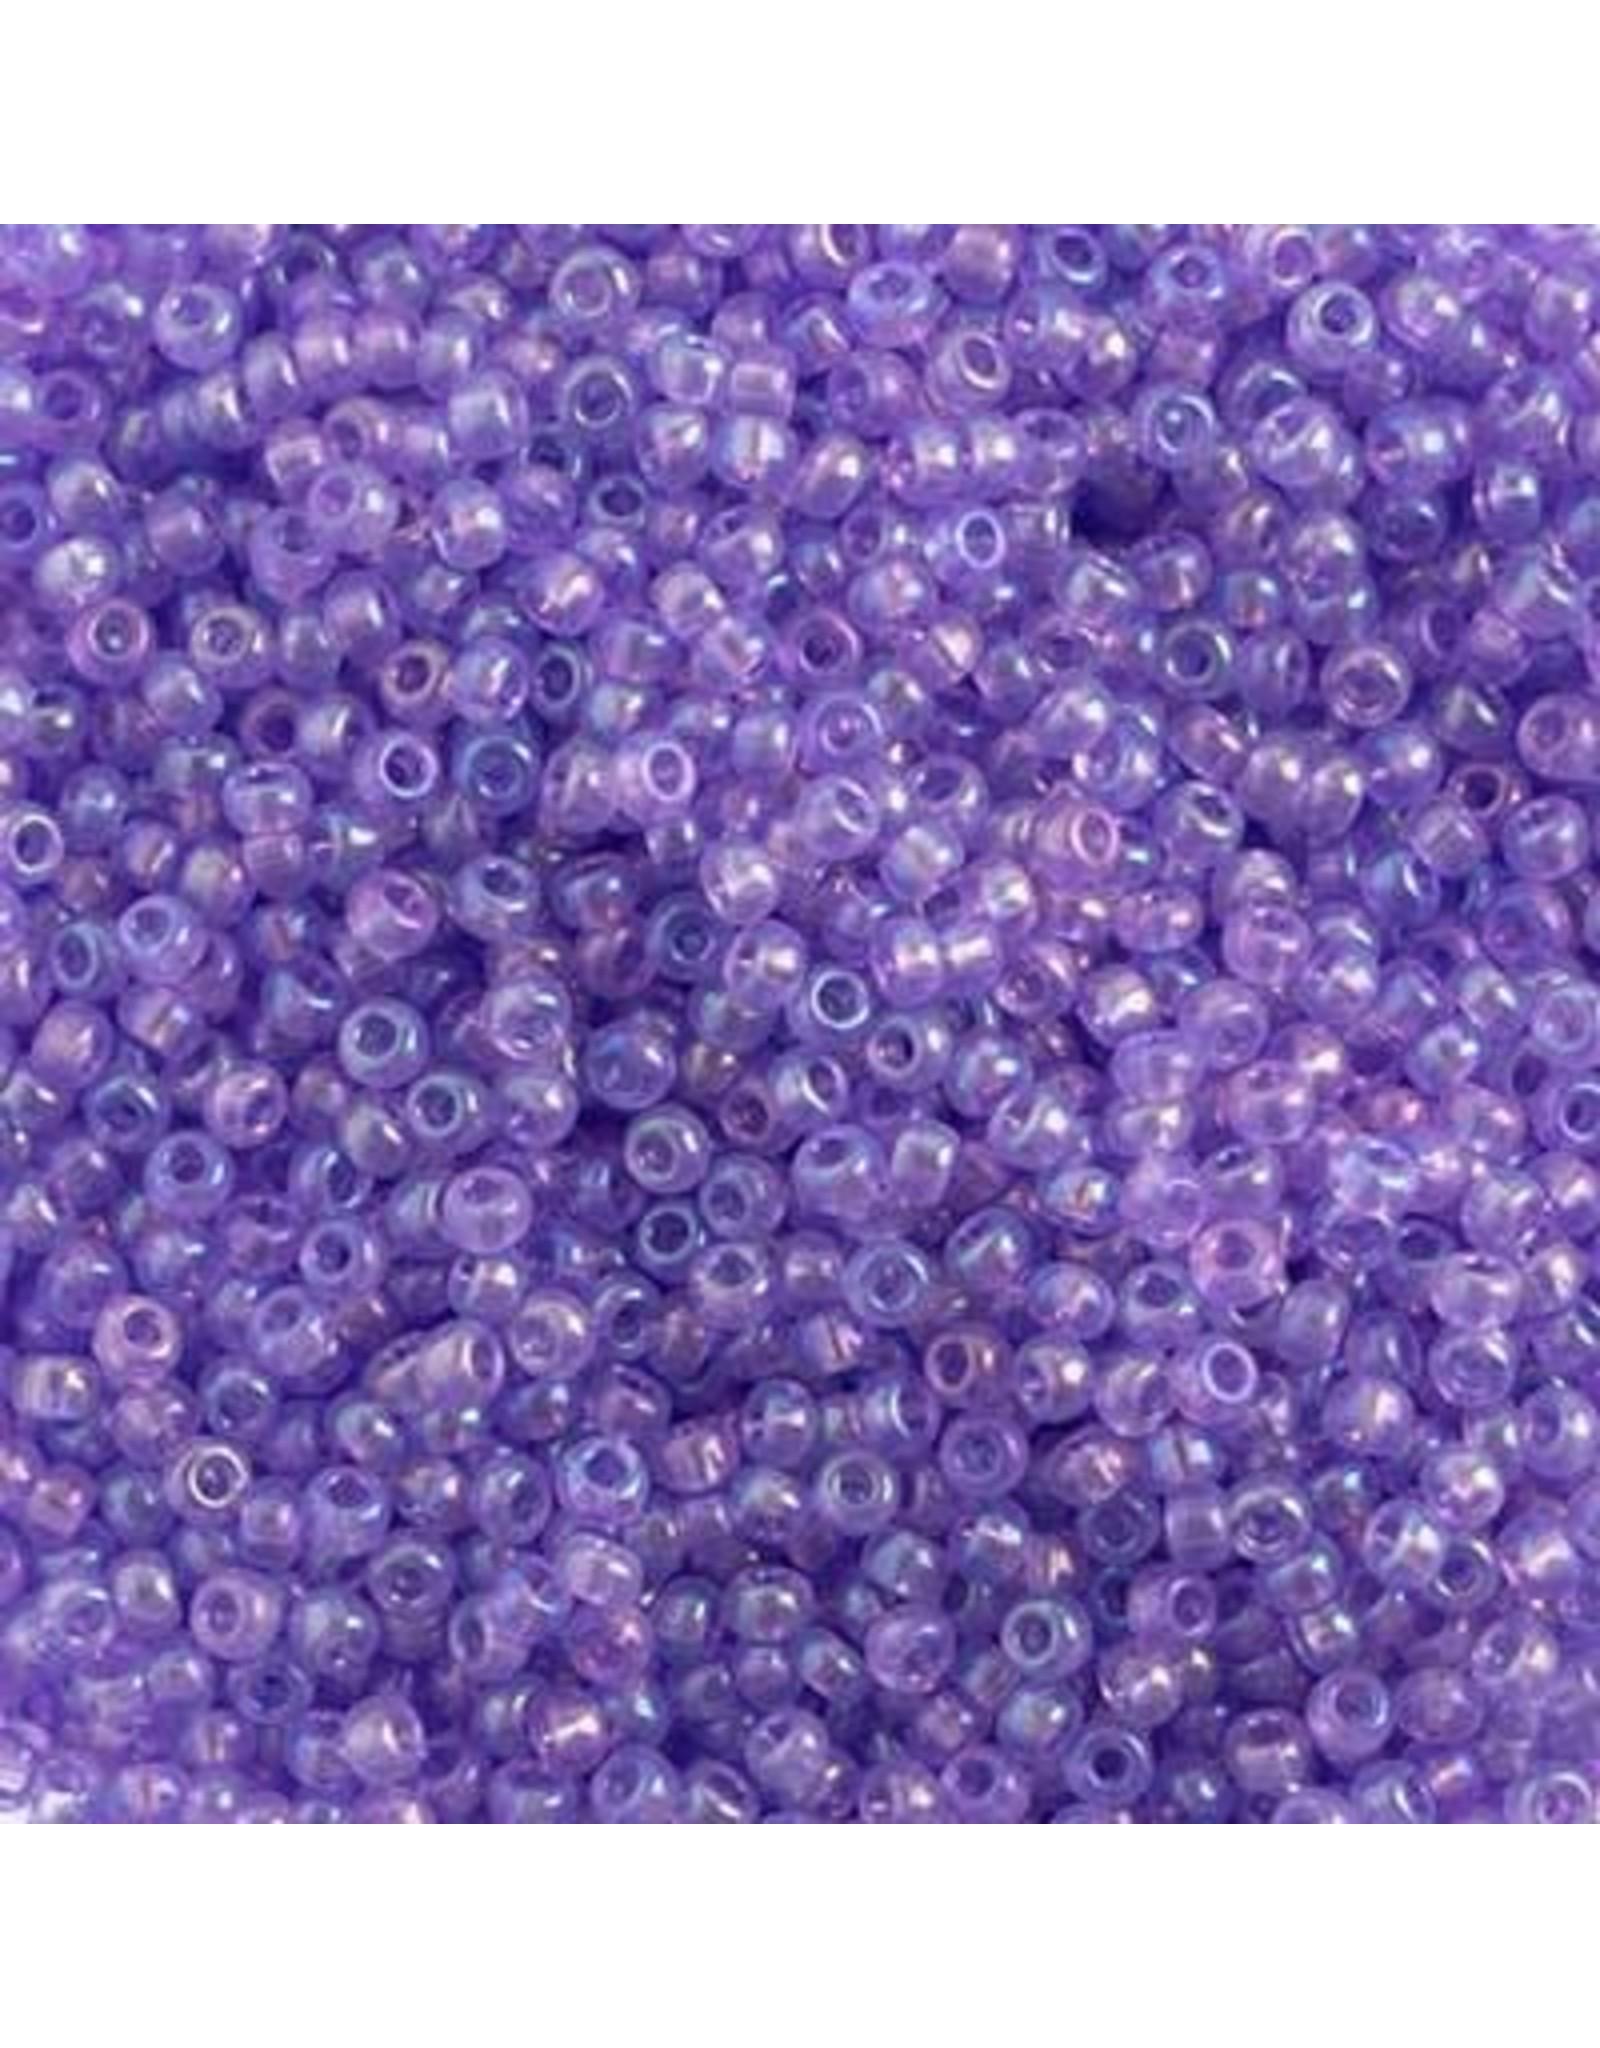 Czech 2402 10   Seed 20g Transparent Mauve Purple AB